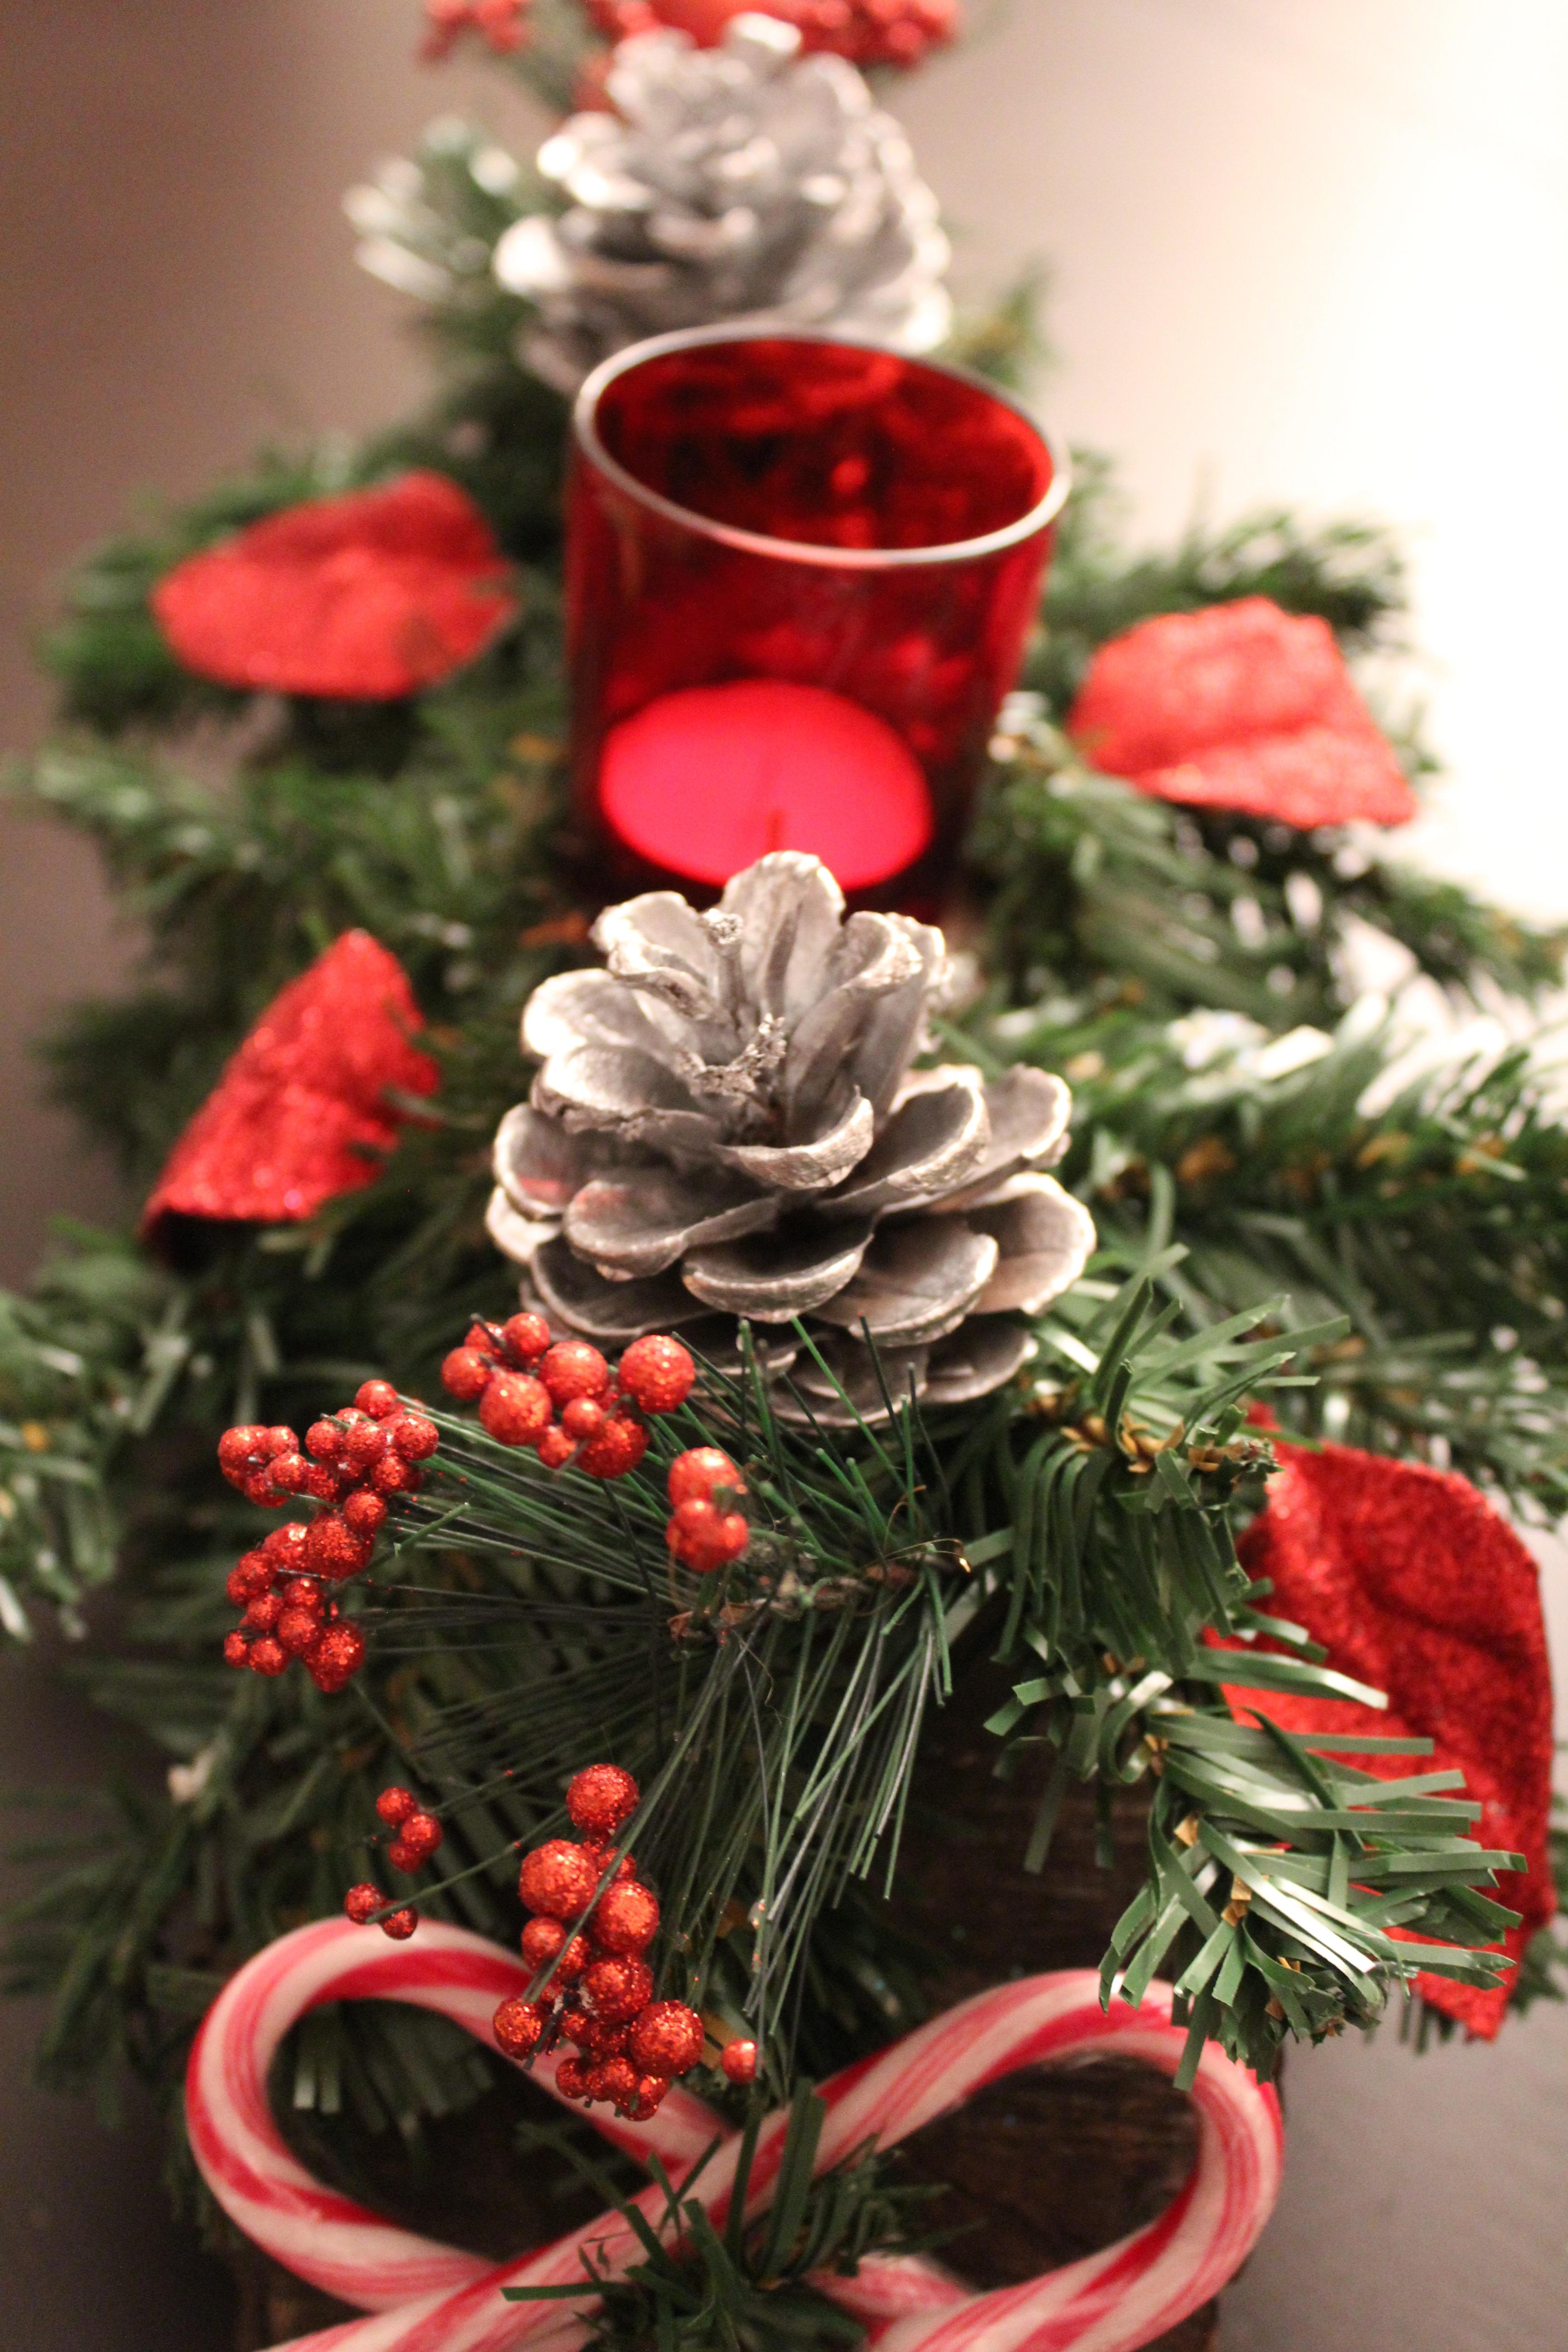 e27b71706cfd Free Images : winter, petal, foliage, green, pinecone, money ...